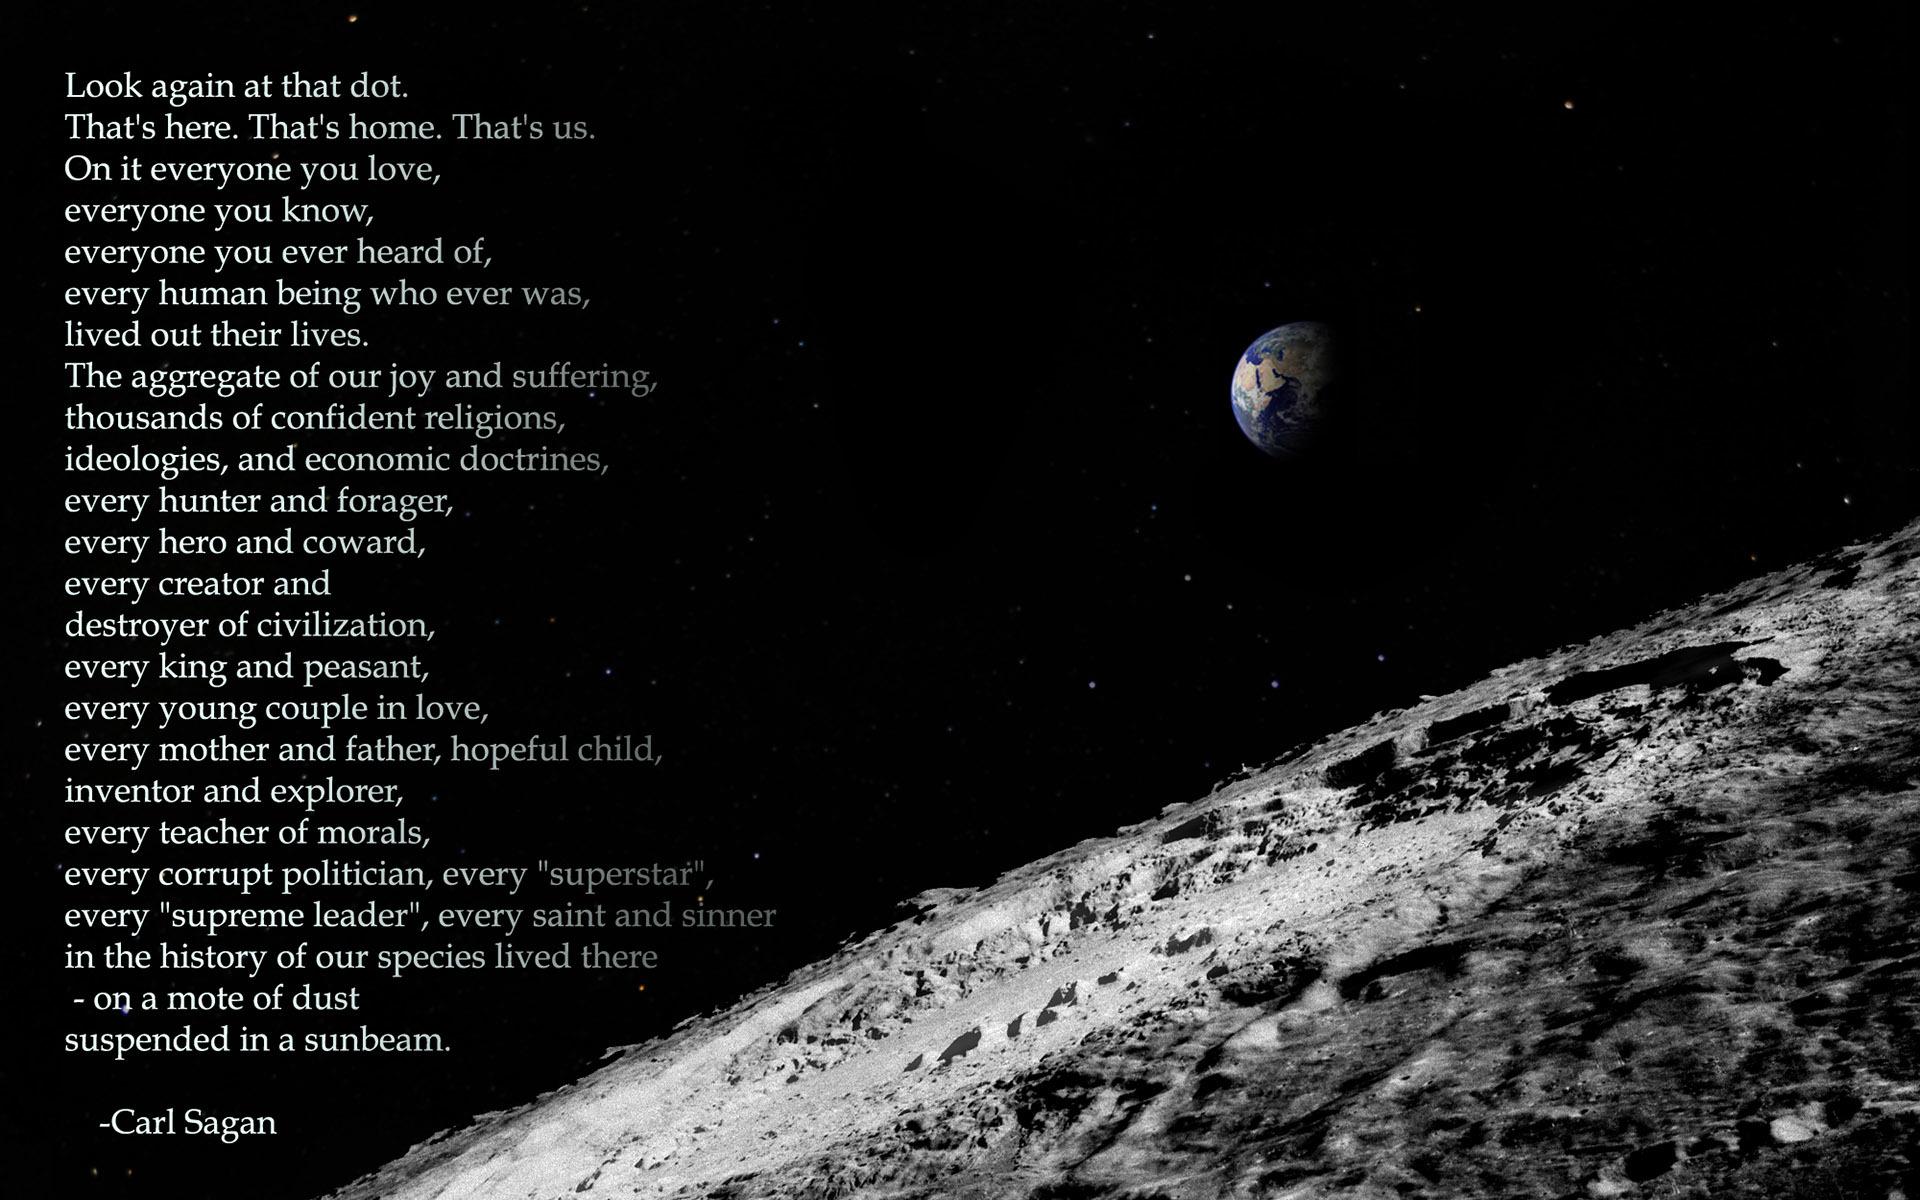 Carl Sagan Quote Hd Wallpaper Carl Sagan Quote Hd Wallpaper